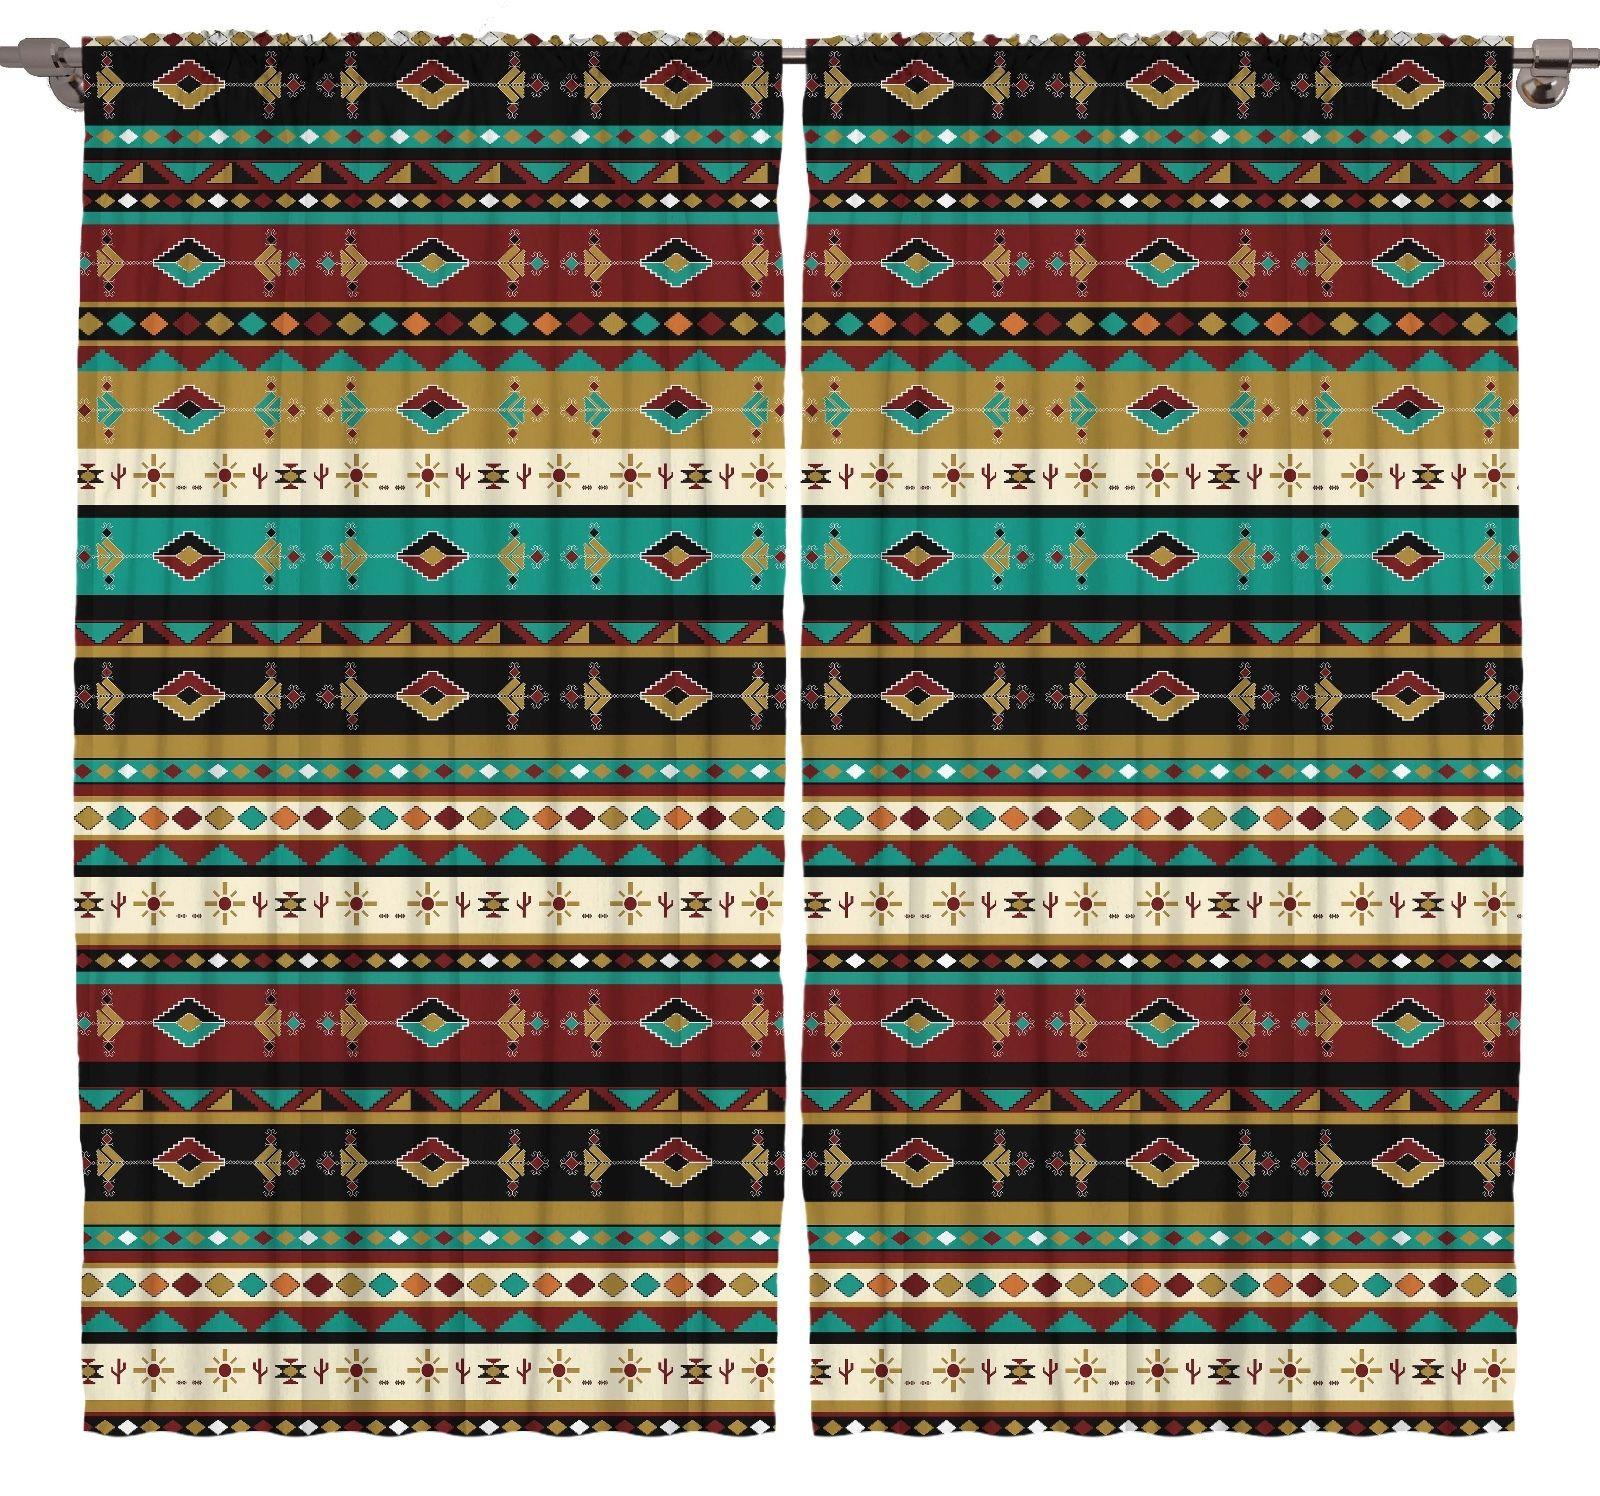 Tribal Ethnic Style Pattern African Design Decor